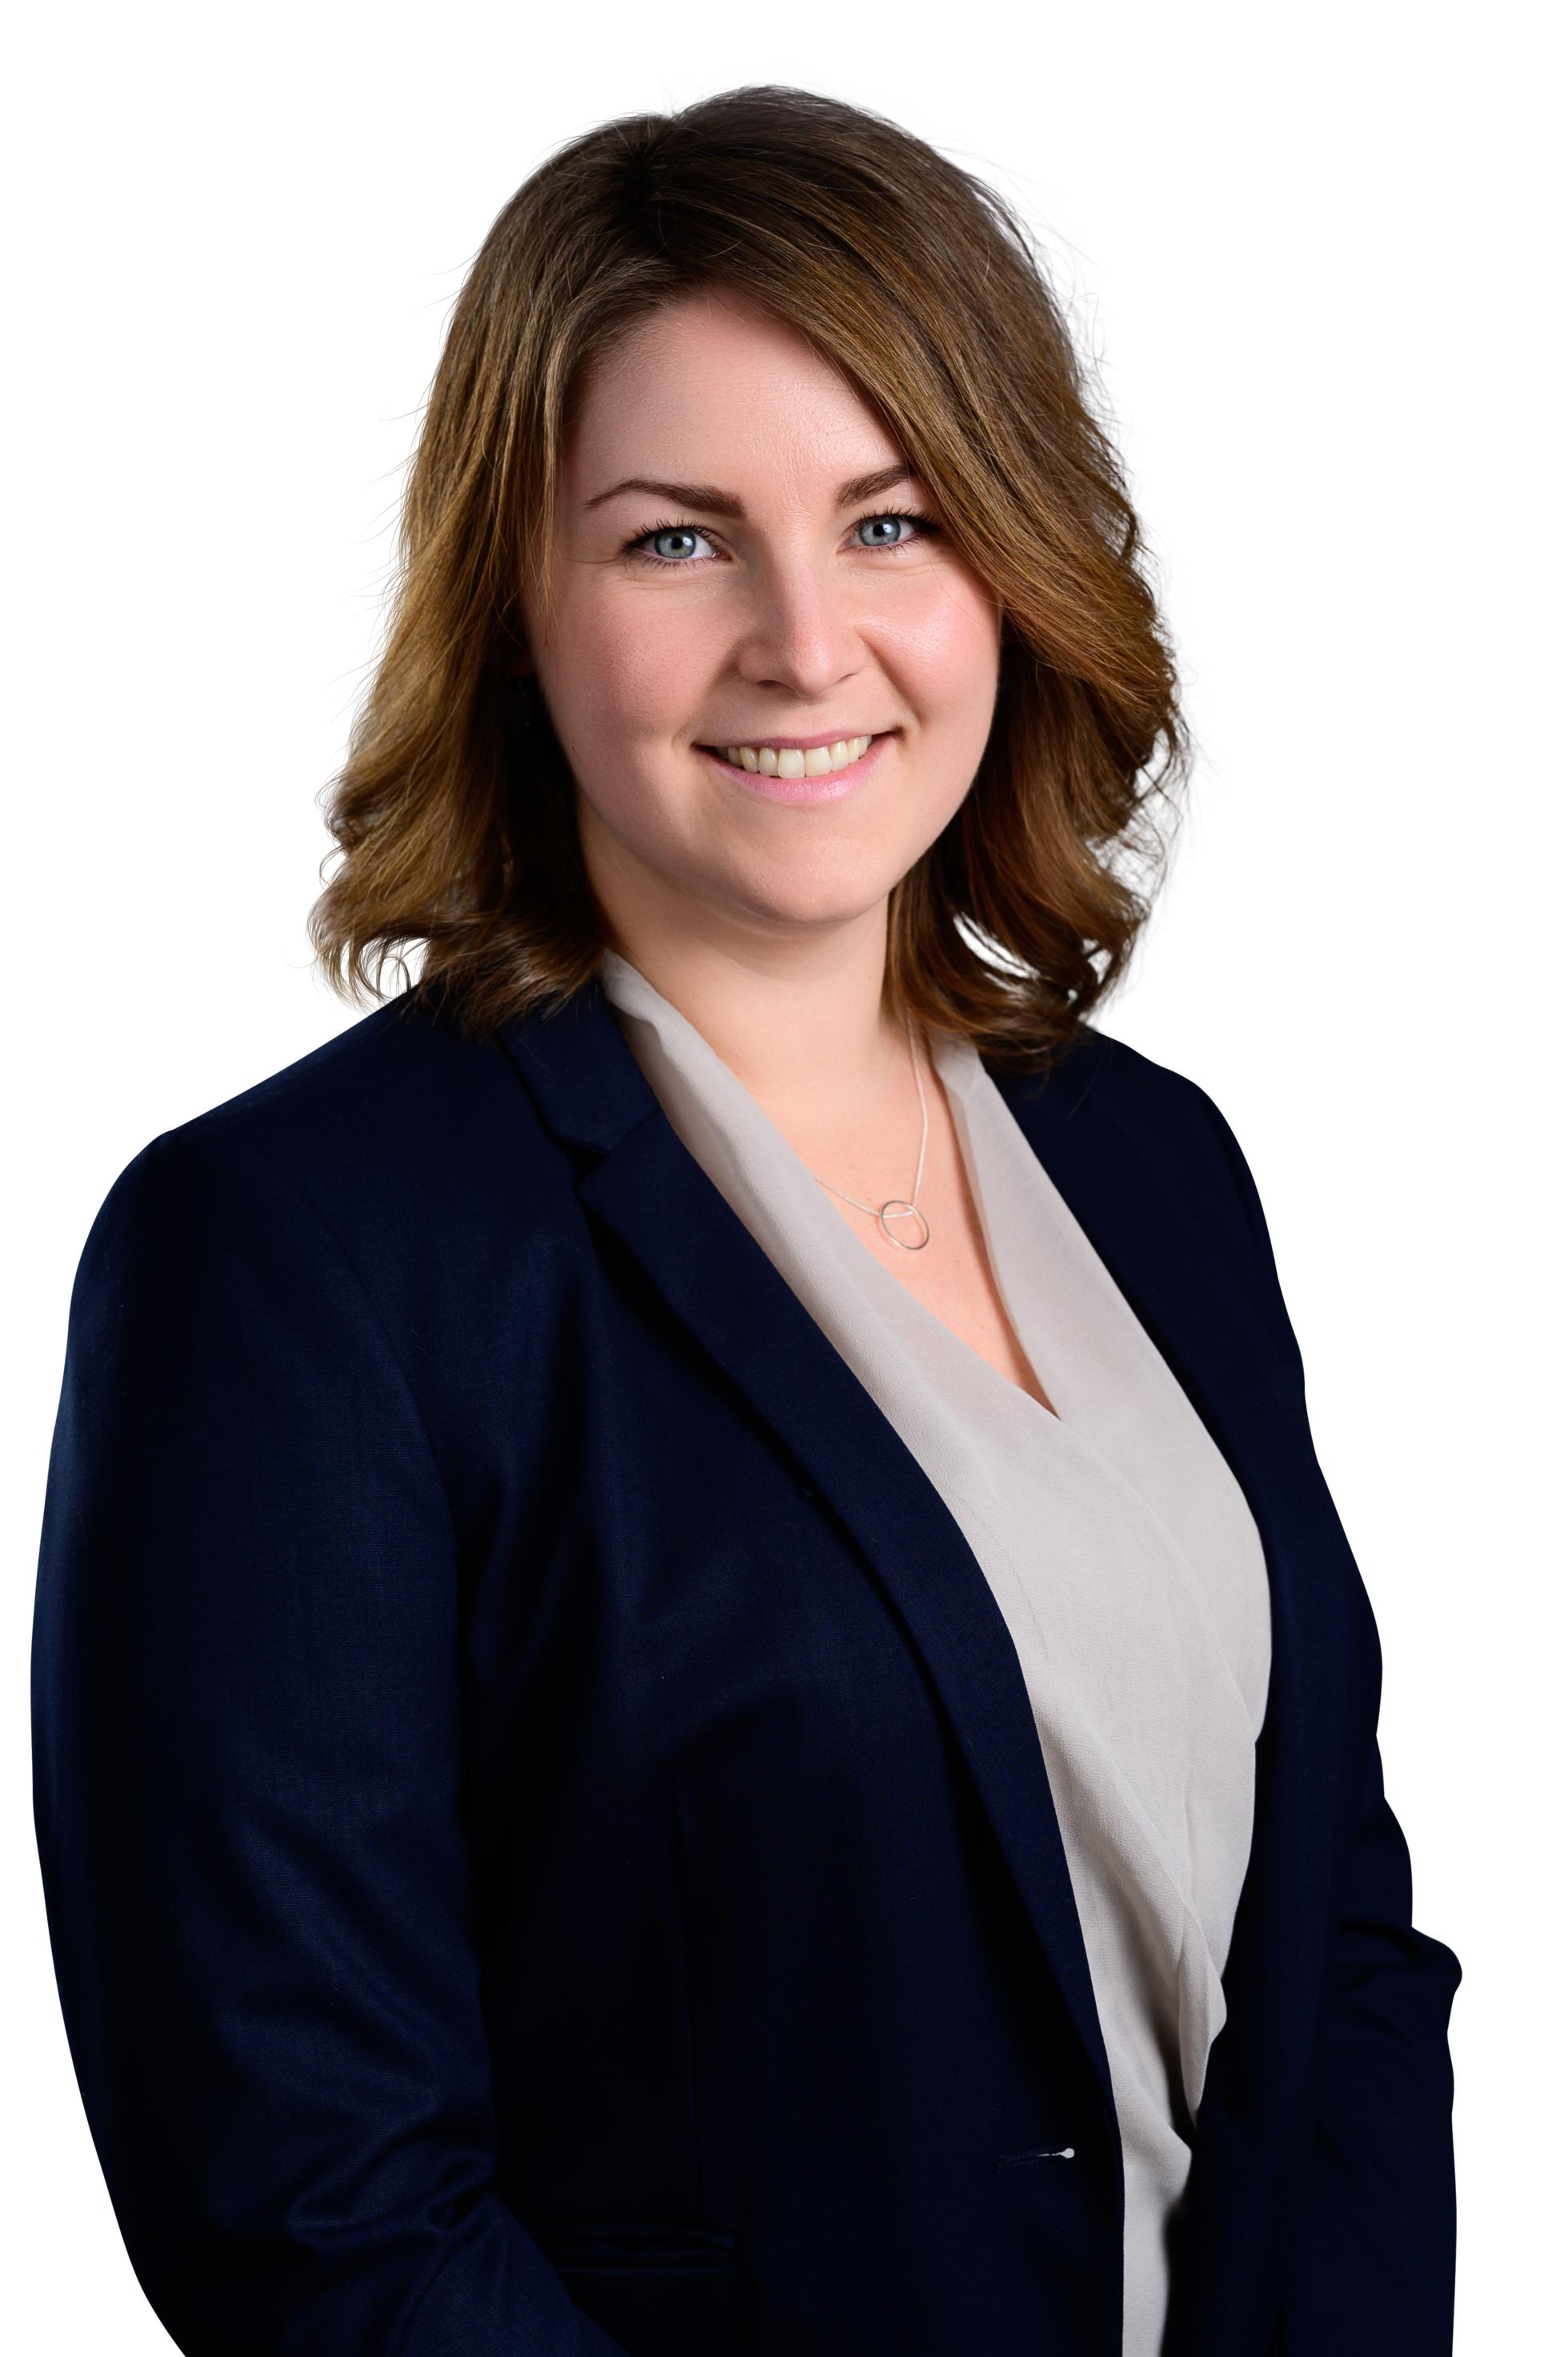 Sara Oxelmark